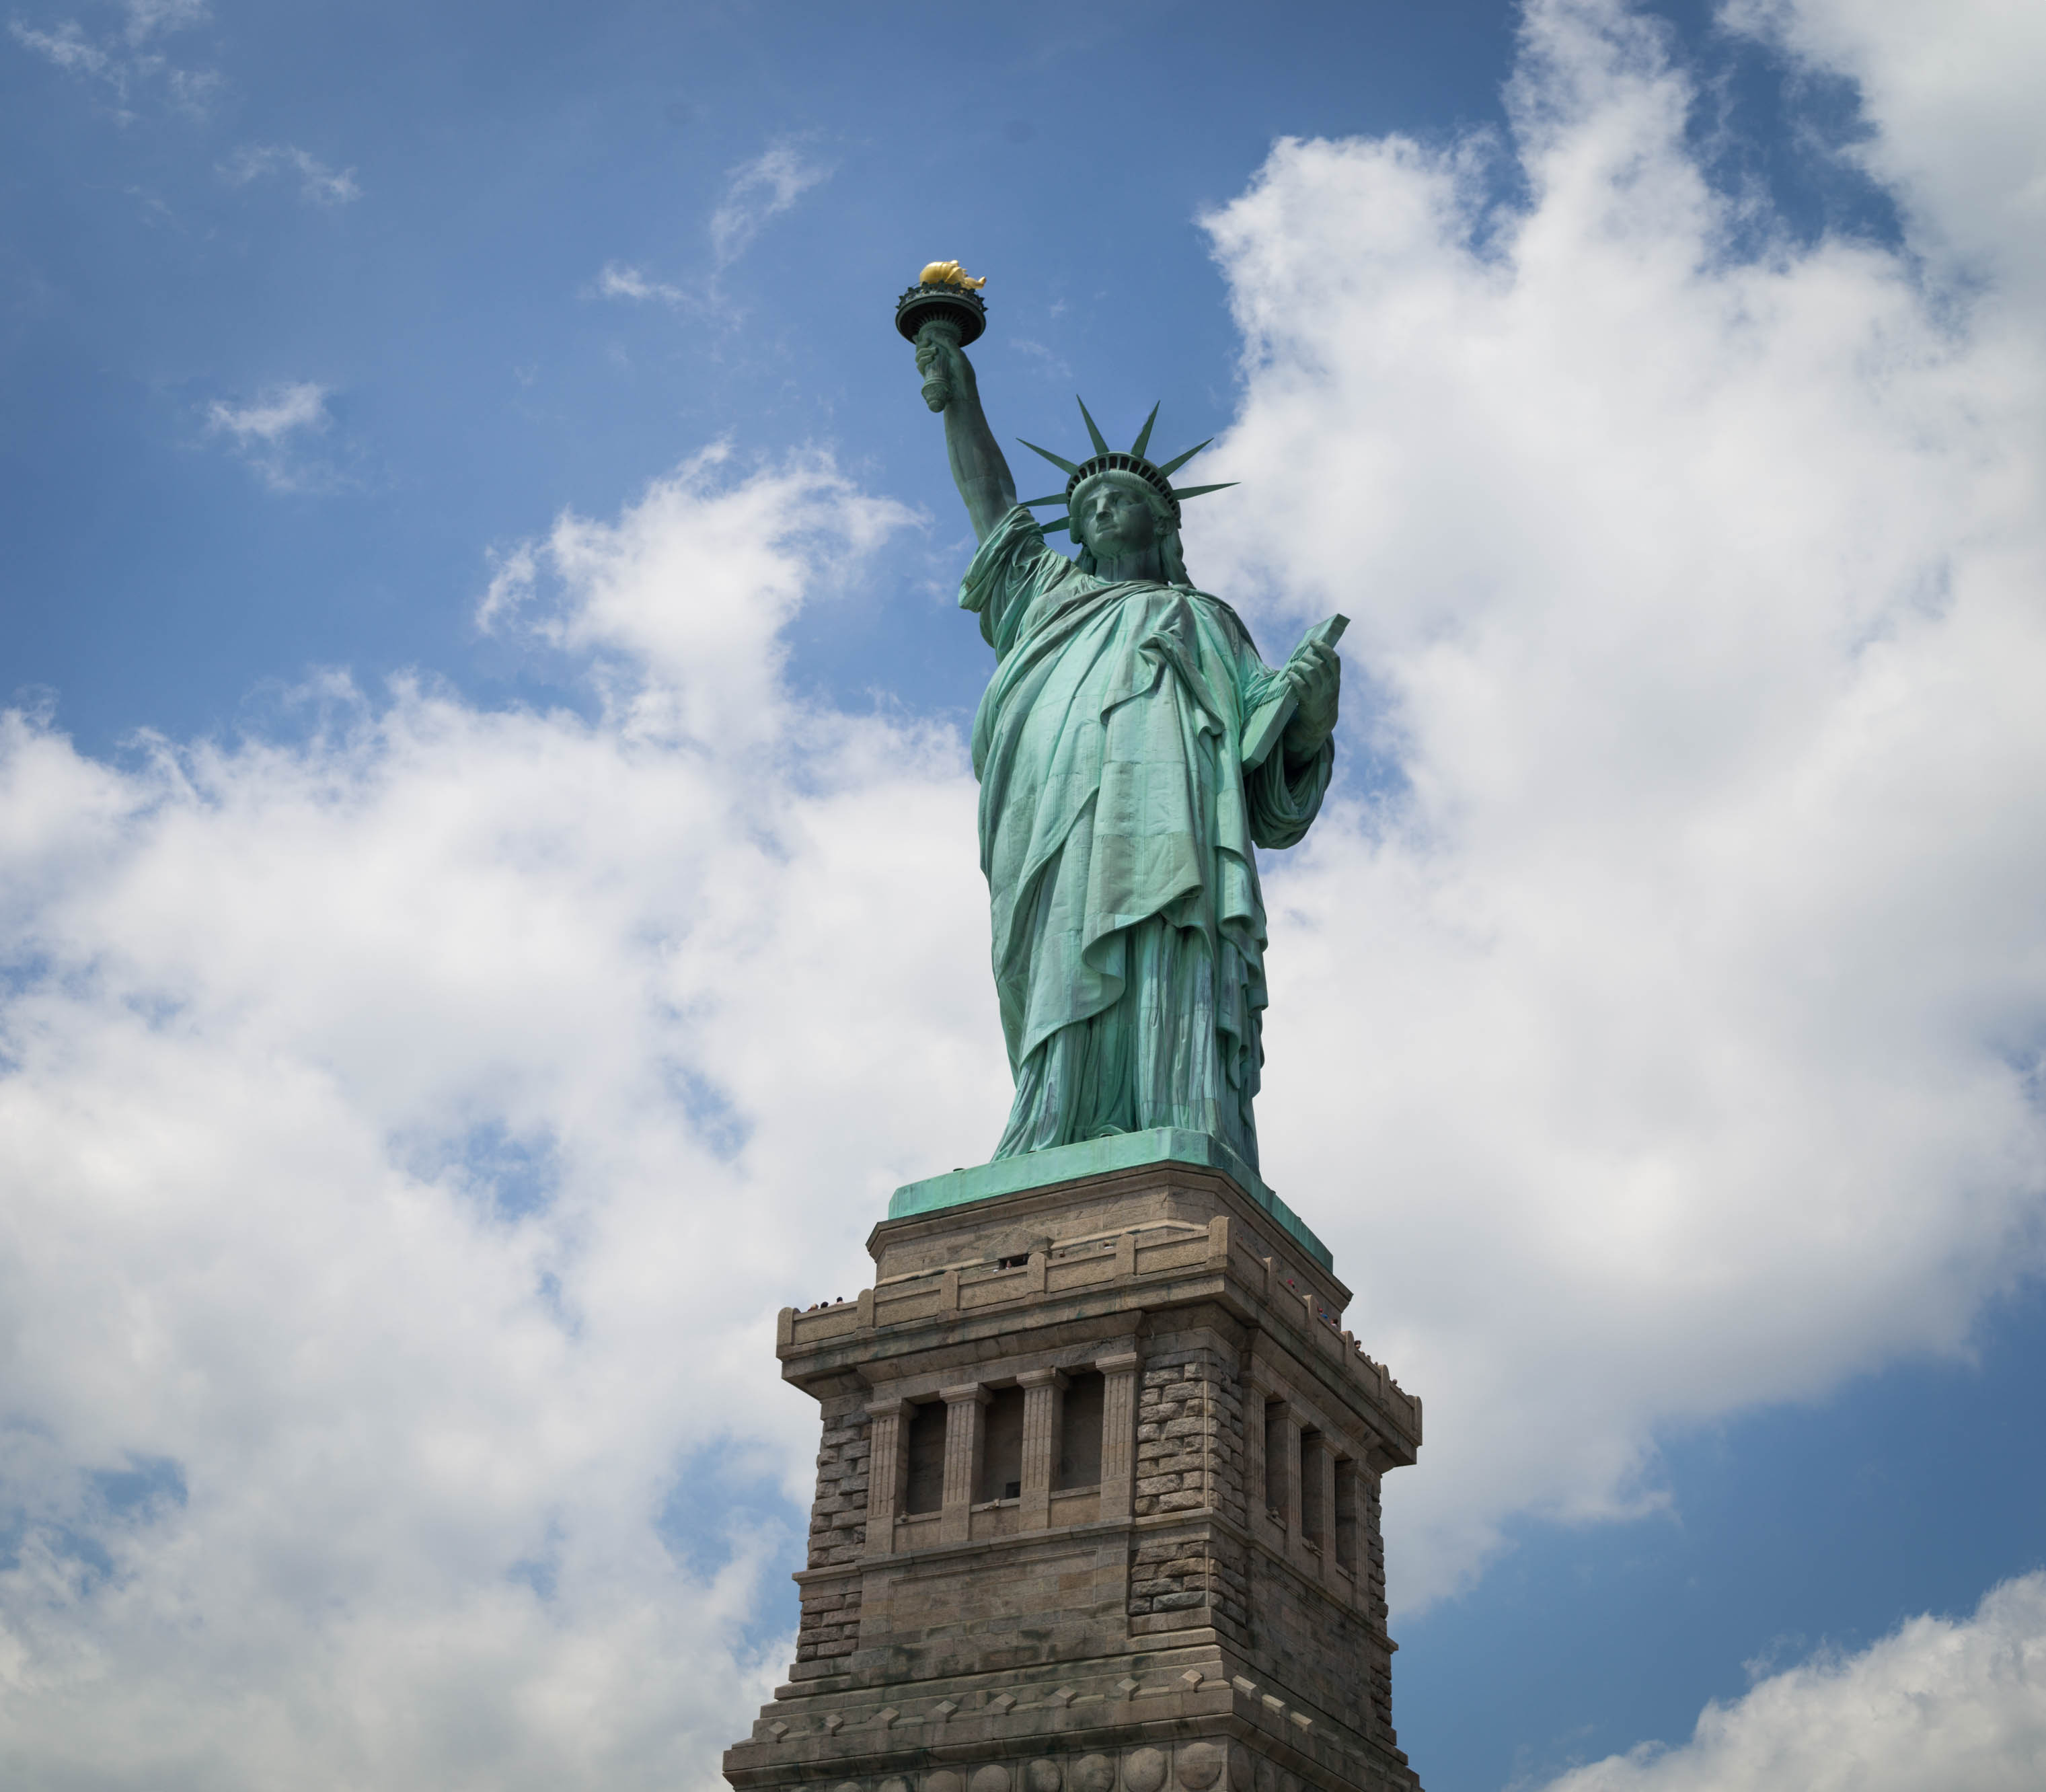 La statue de la Liberté tenant le flambeau et la table de la loi